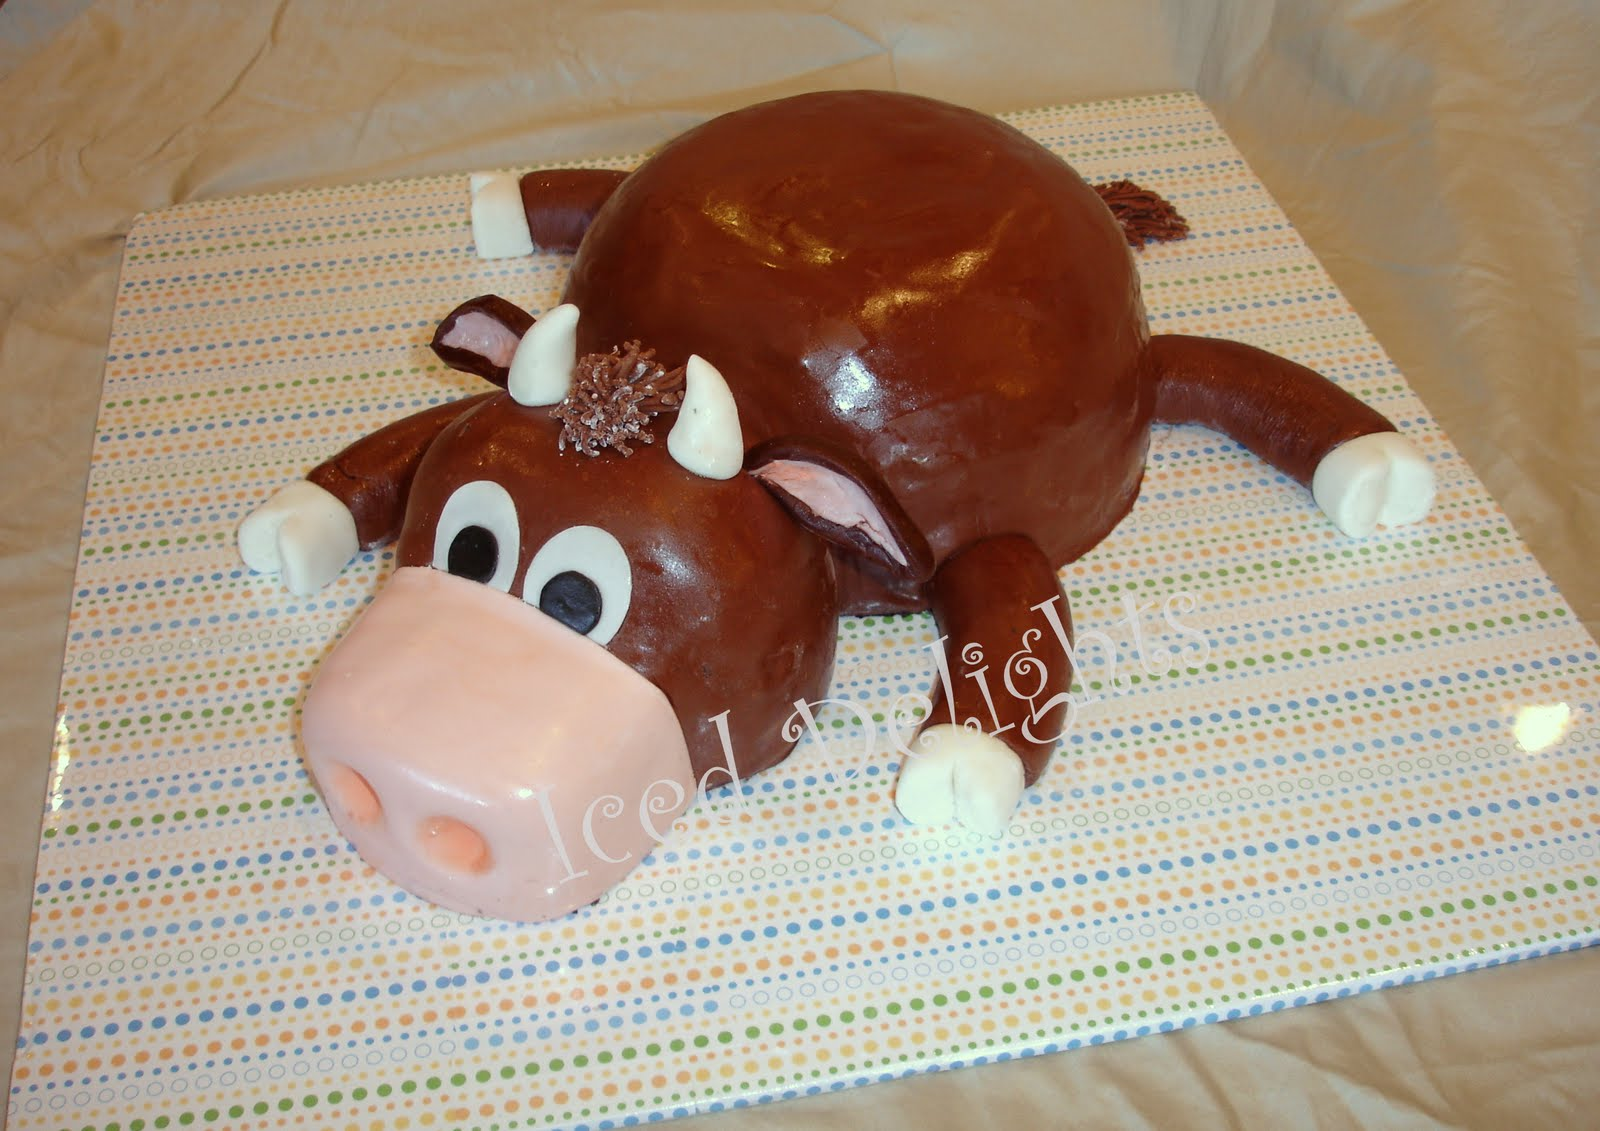 Brown Cow Cakes Birthday Ide Dimage De Gteau